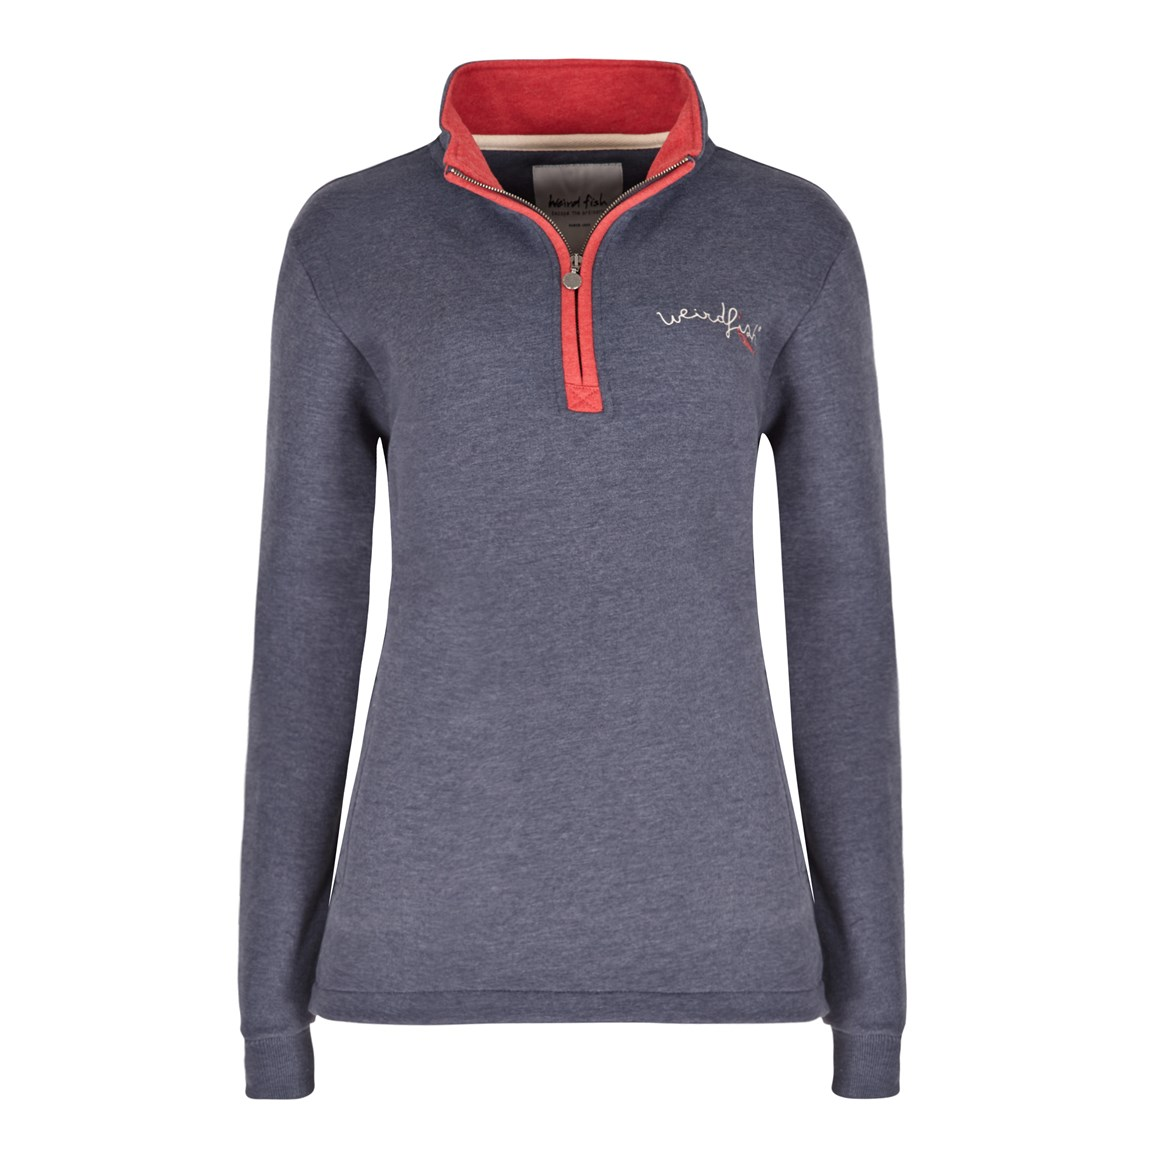 Aurora 1/4 Zip Graphic Print Sweatshirt Dark Navy